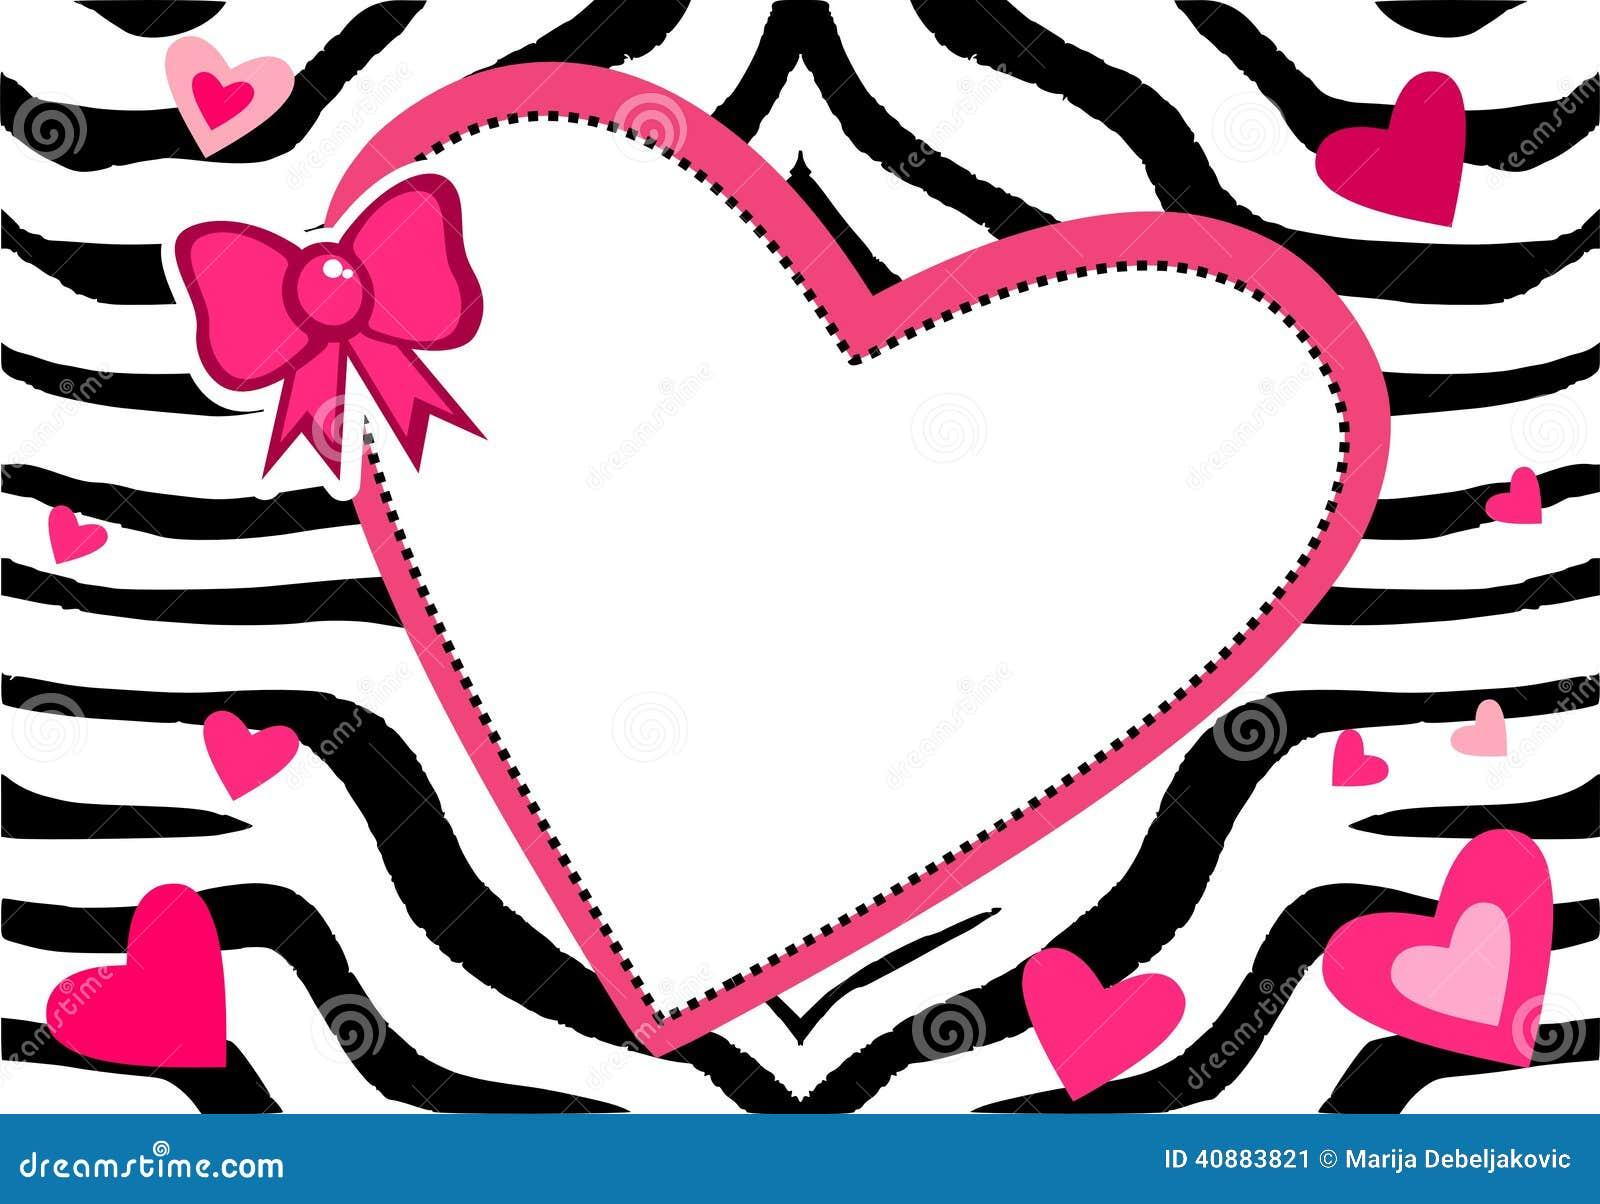 Free Zebra Clipart  Clip Art Pictures  Graphics